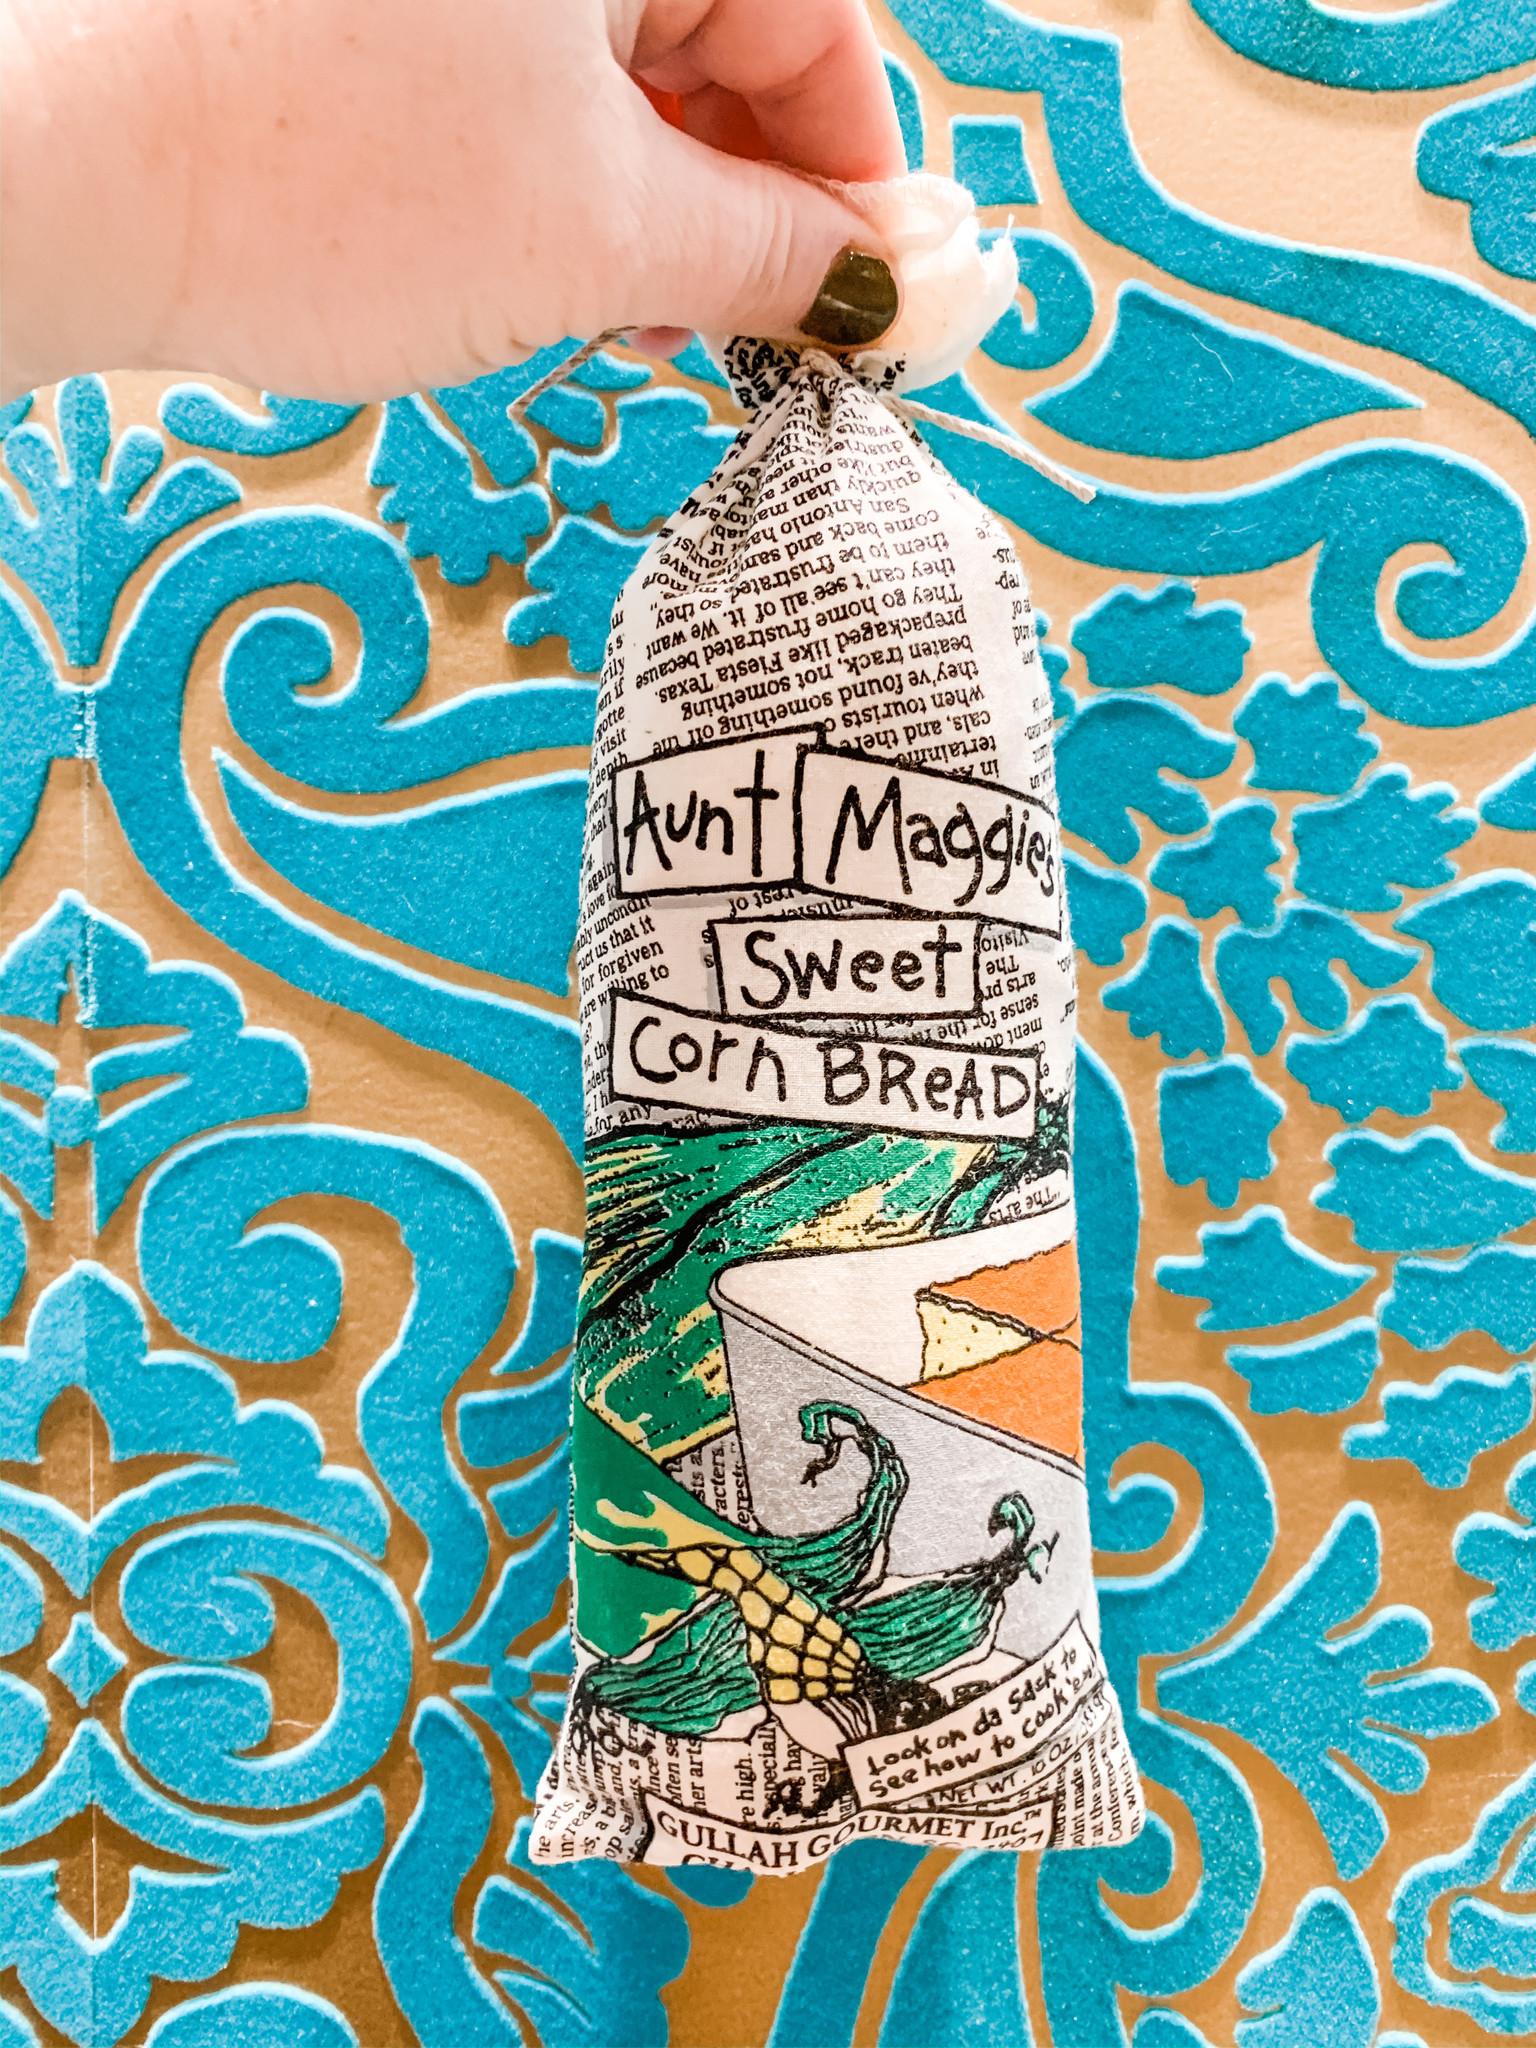 Gullah Gourmet Aunt Maggie's Sweet Cornbread